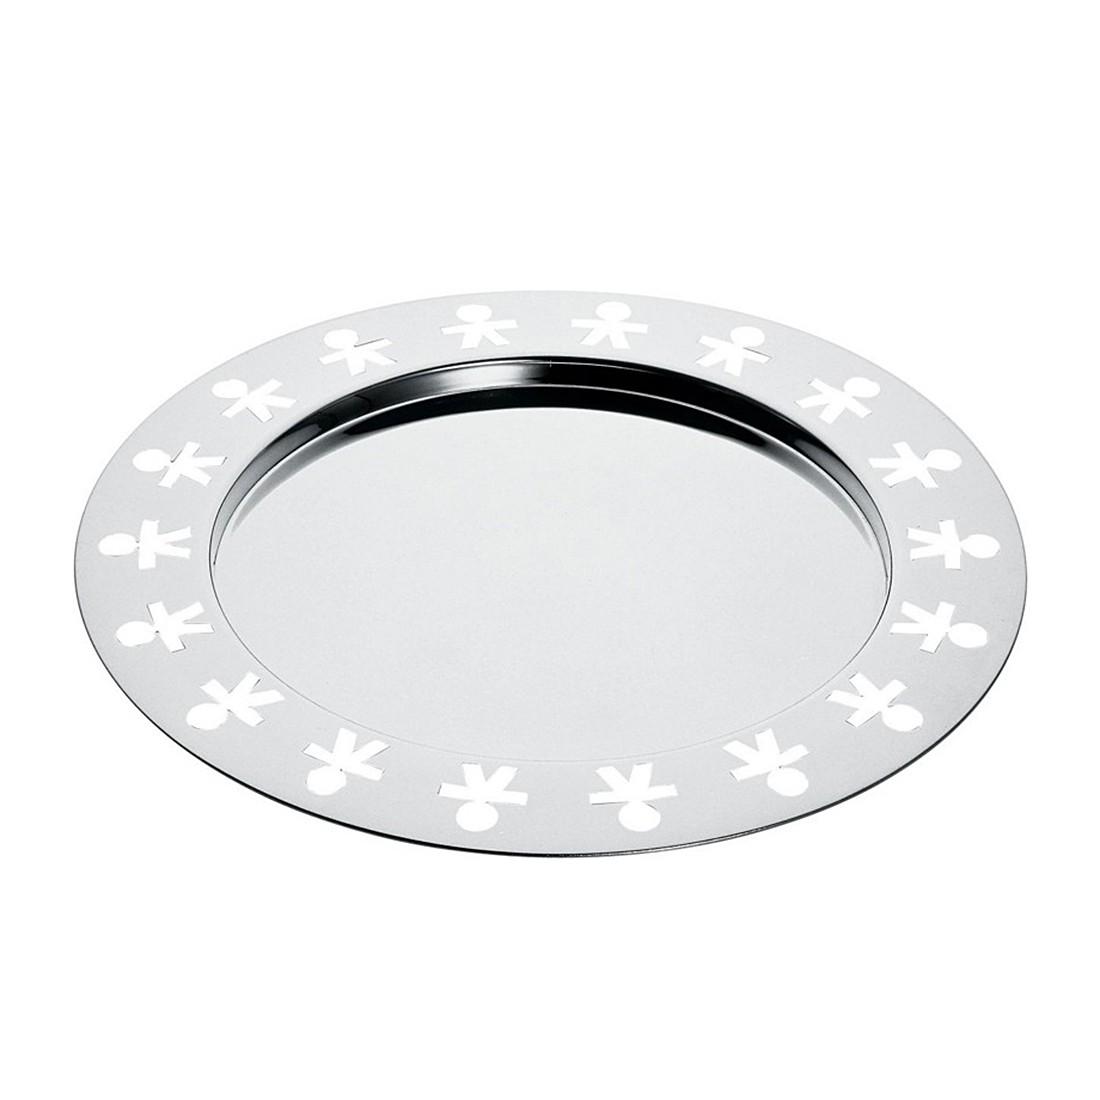 Platte Girotondo- oval/58 x 45/5 cm, Alessi günstig